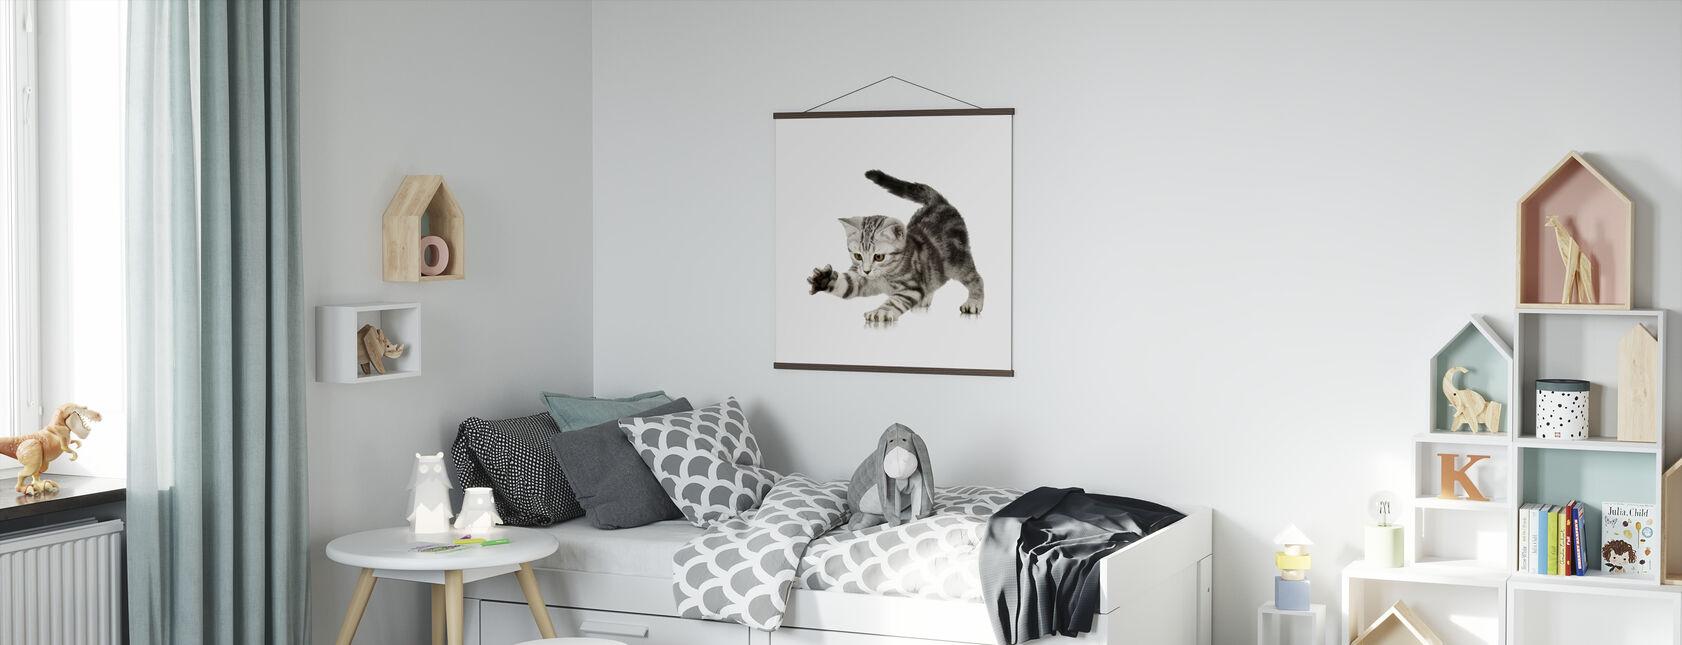 Grabbing - Poster - Kids Room